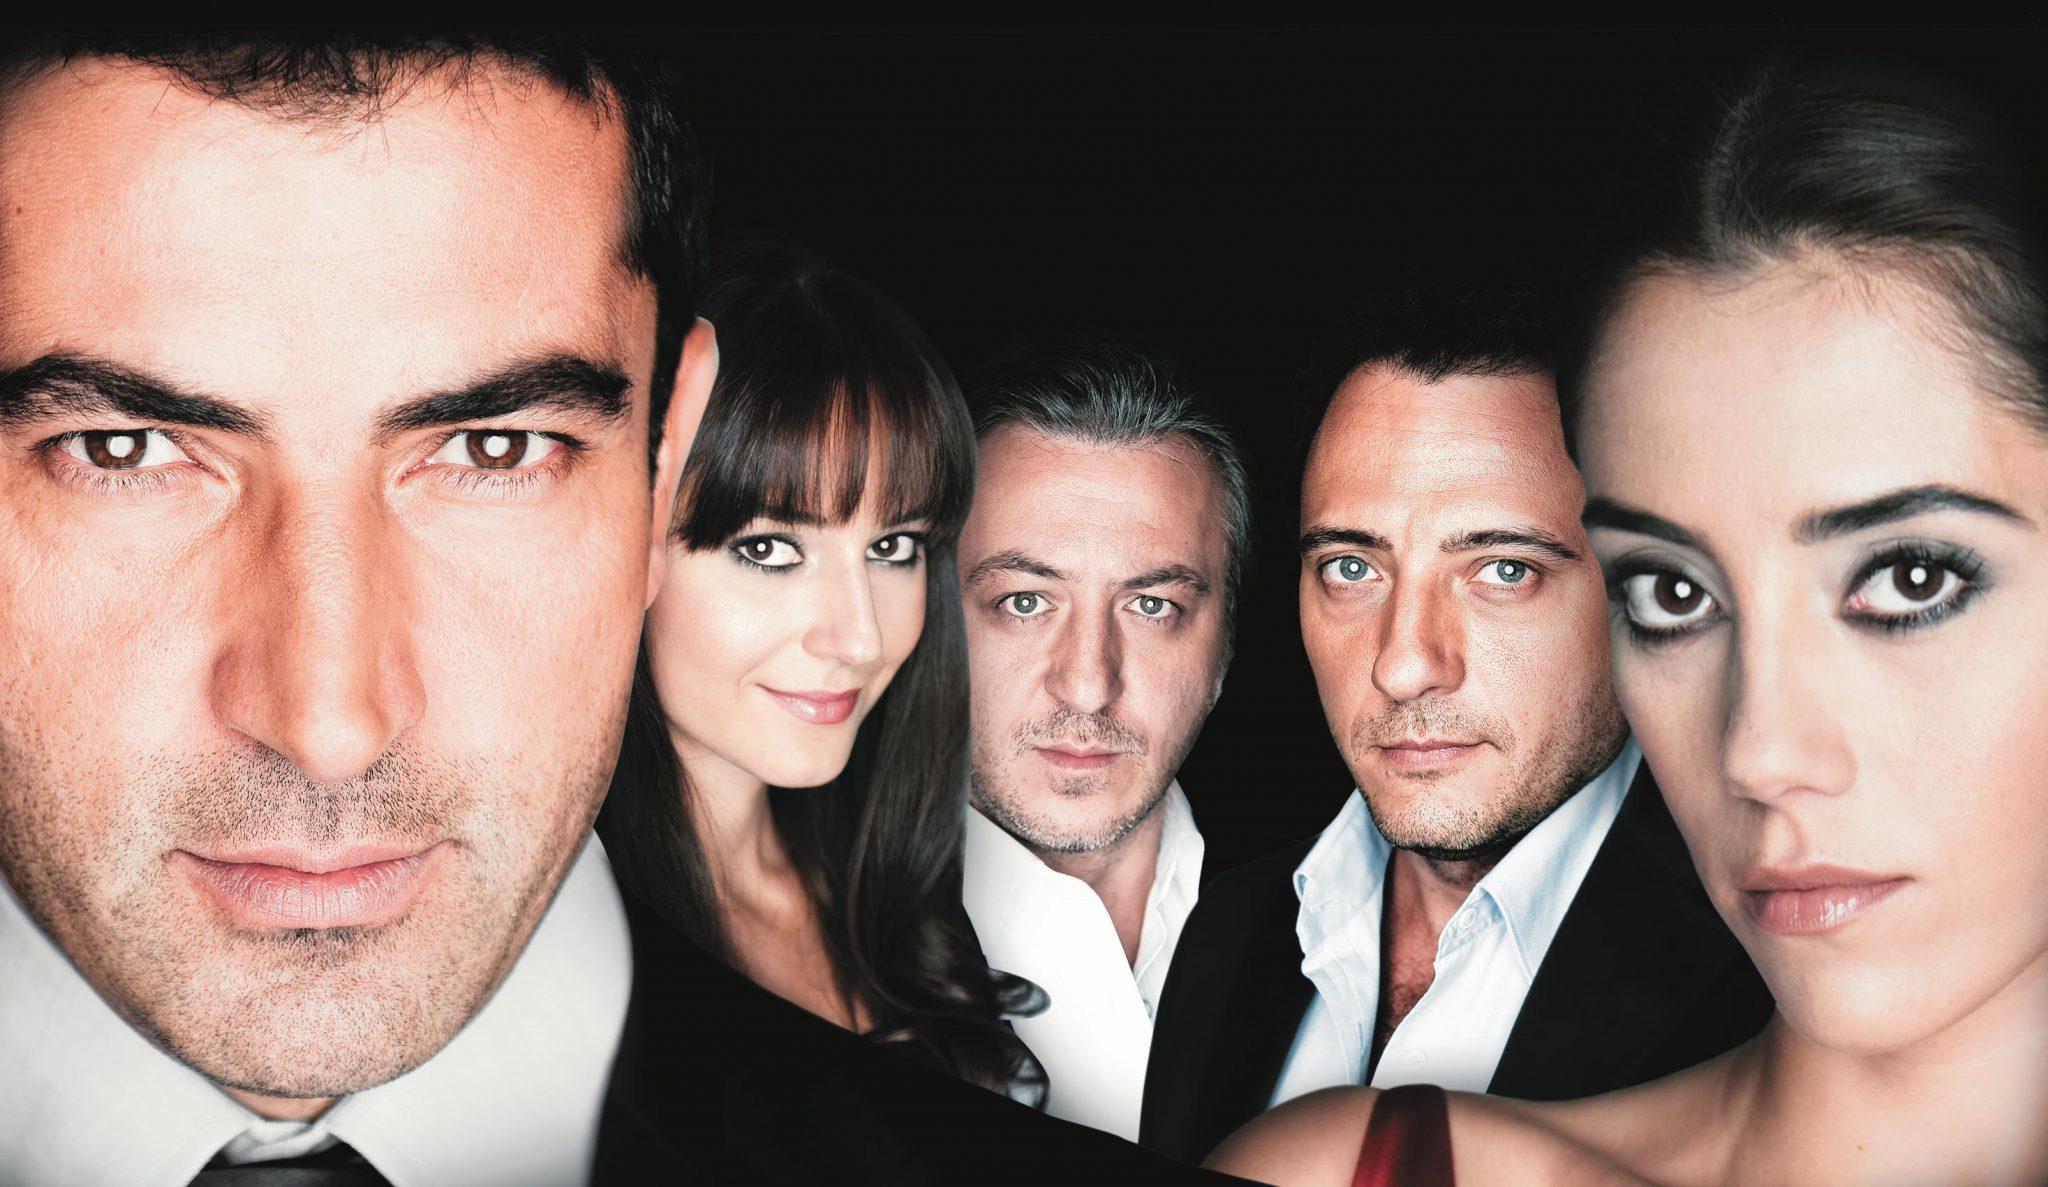 Show TV's Turkish drama Ezel